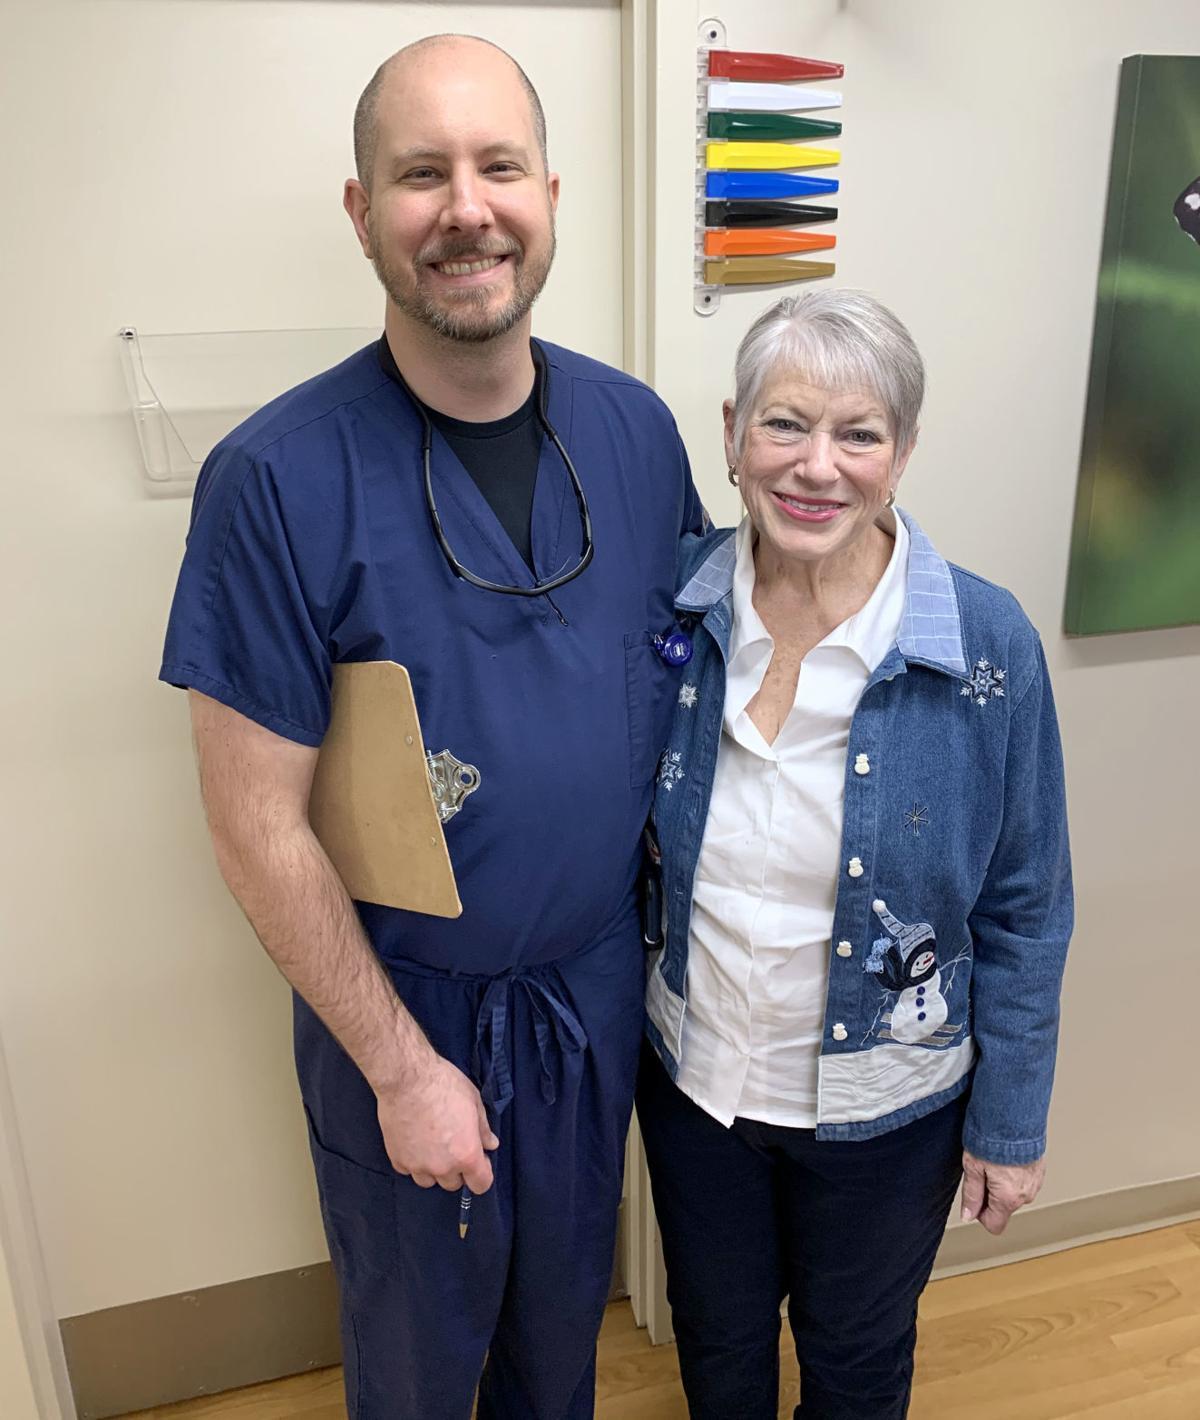 gwen and dr. creel.jpeg